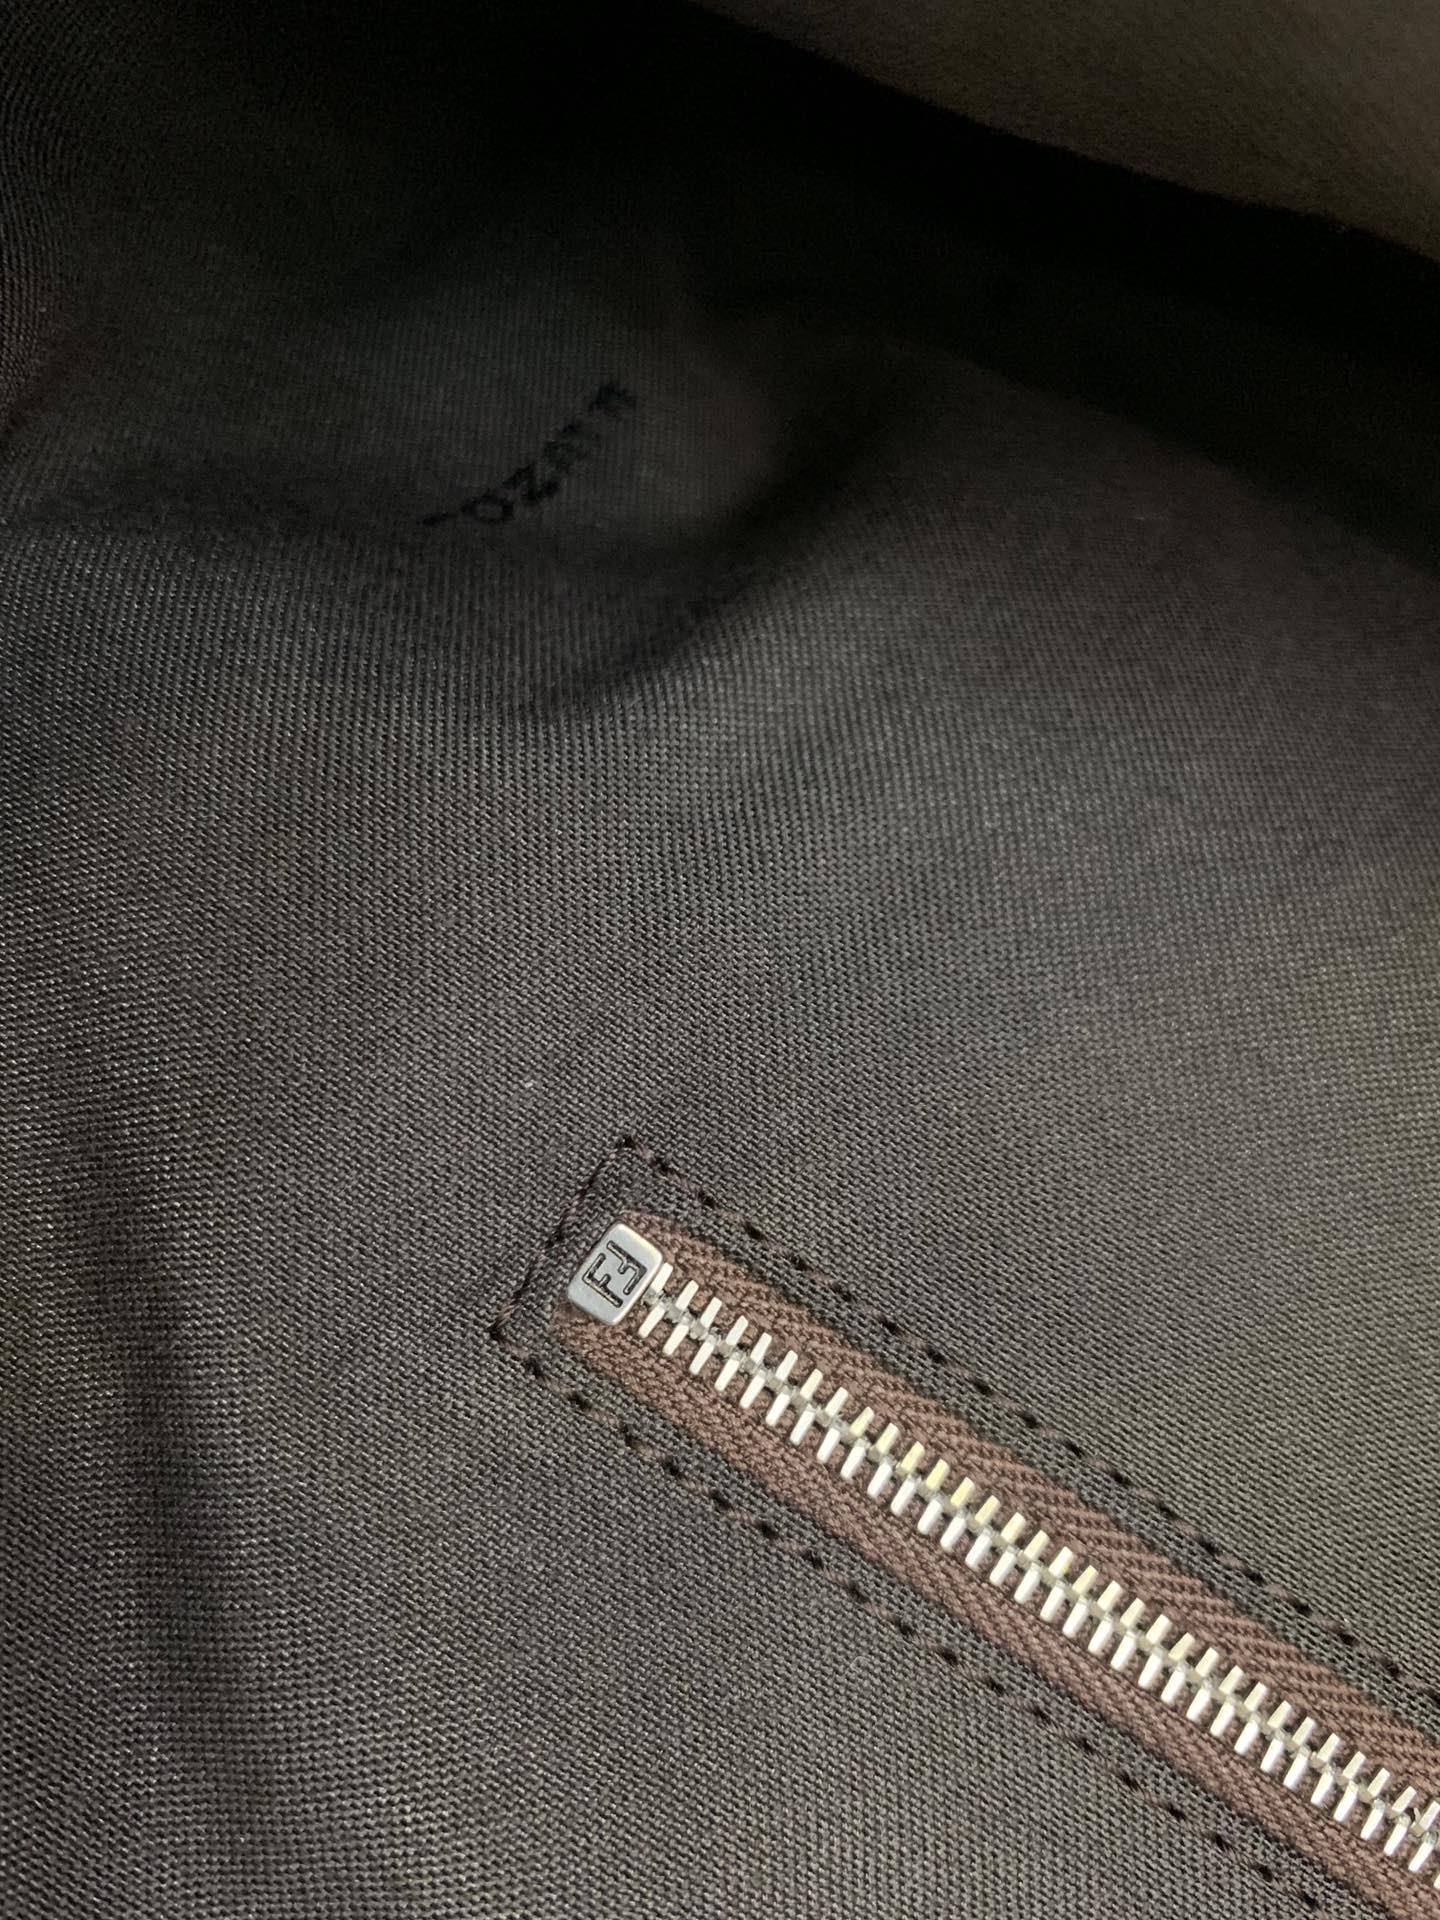 FENDI官网 购物袋 双手柄手提袋  实用百搭 38x18x13cm 8833